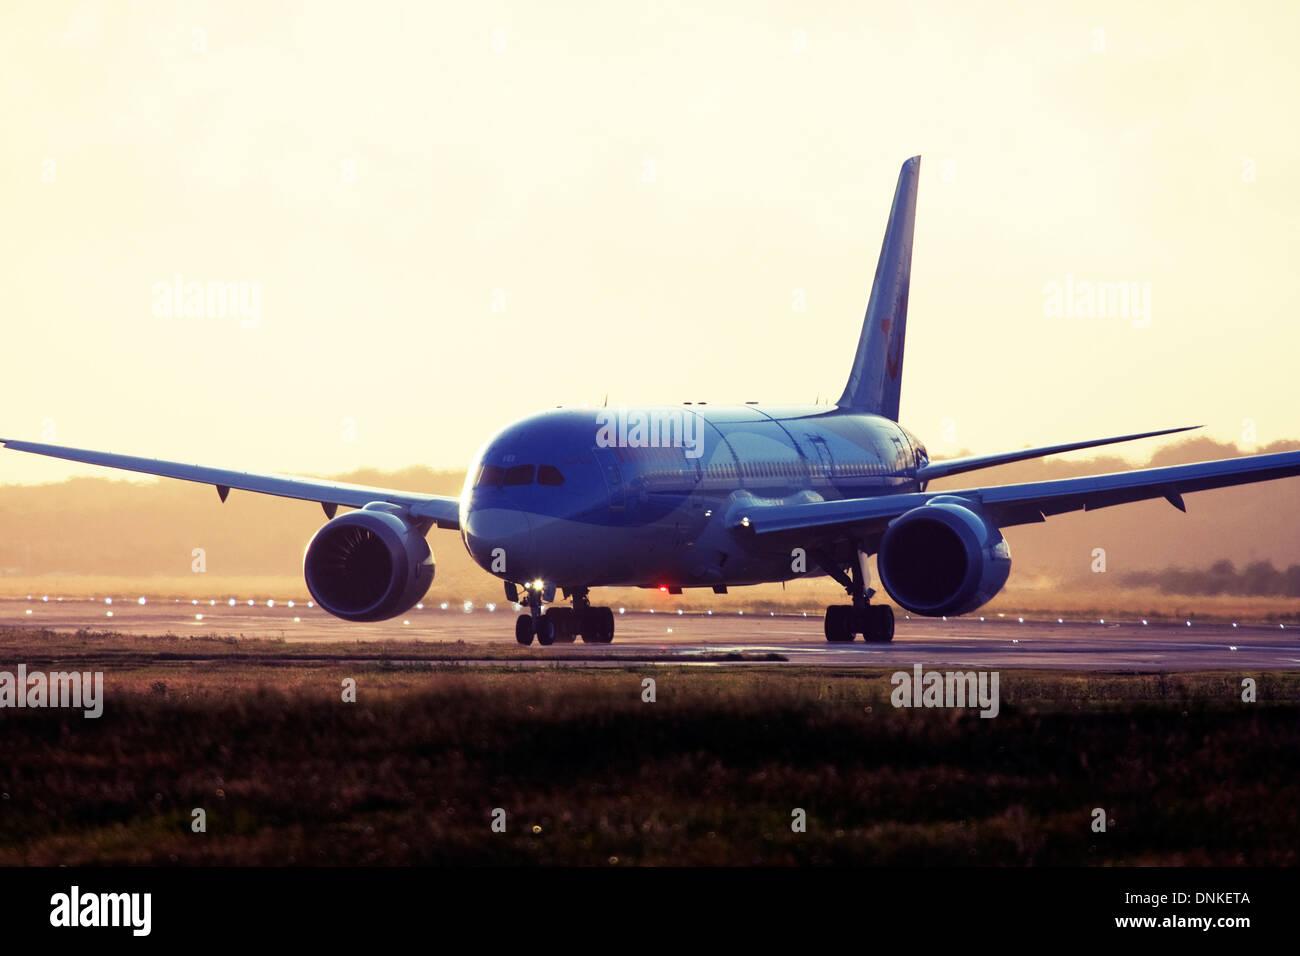 Thomson Airways Boeing 787-8 Dreamliner at London Gatwick Airport, England, UK. Stock Photo